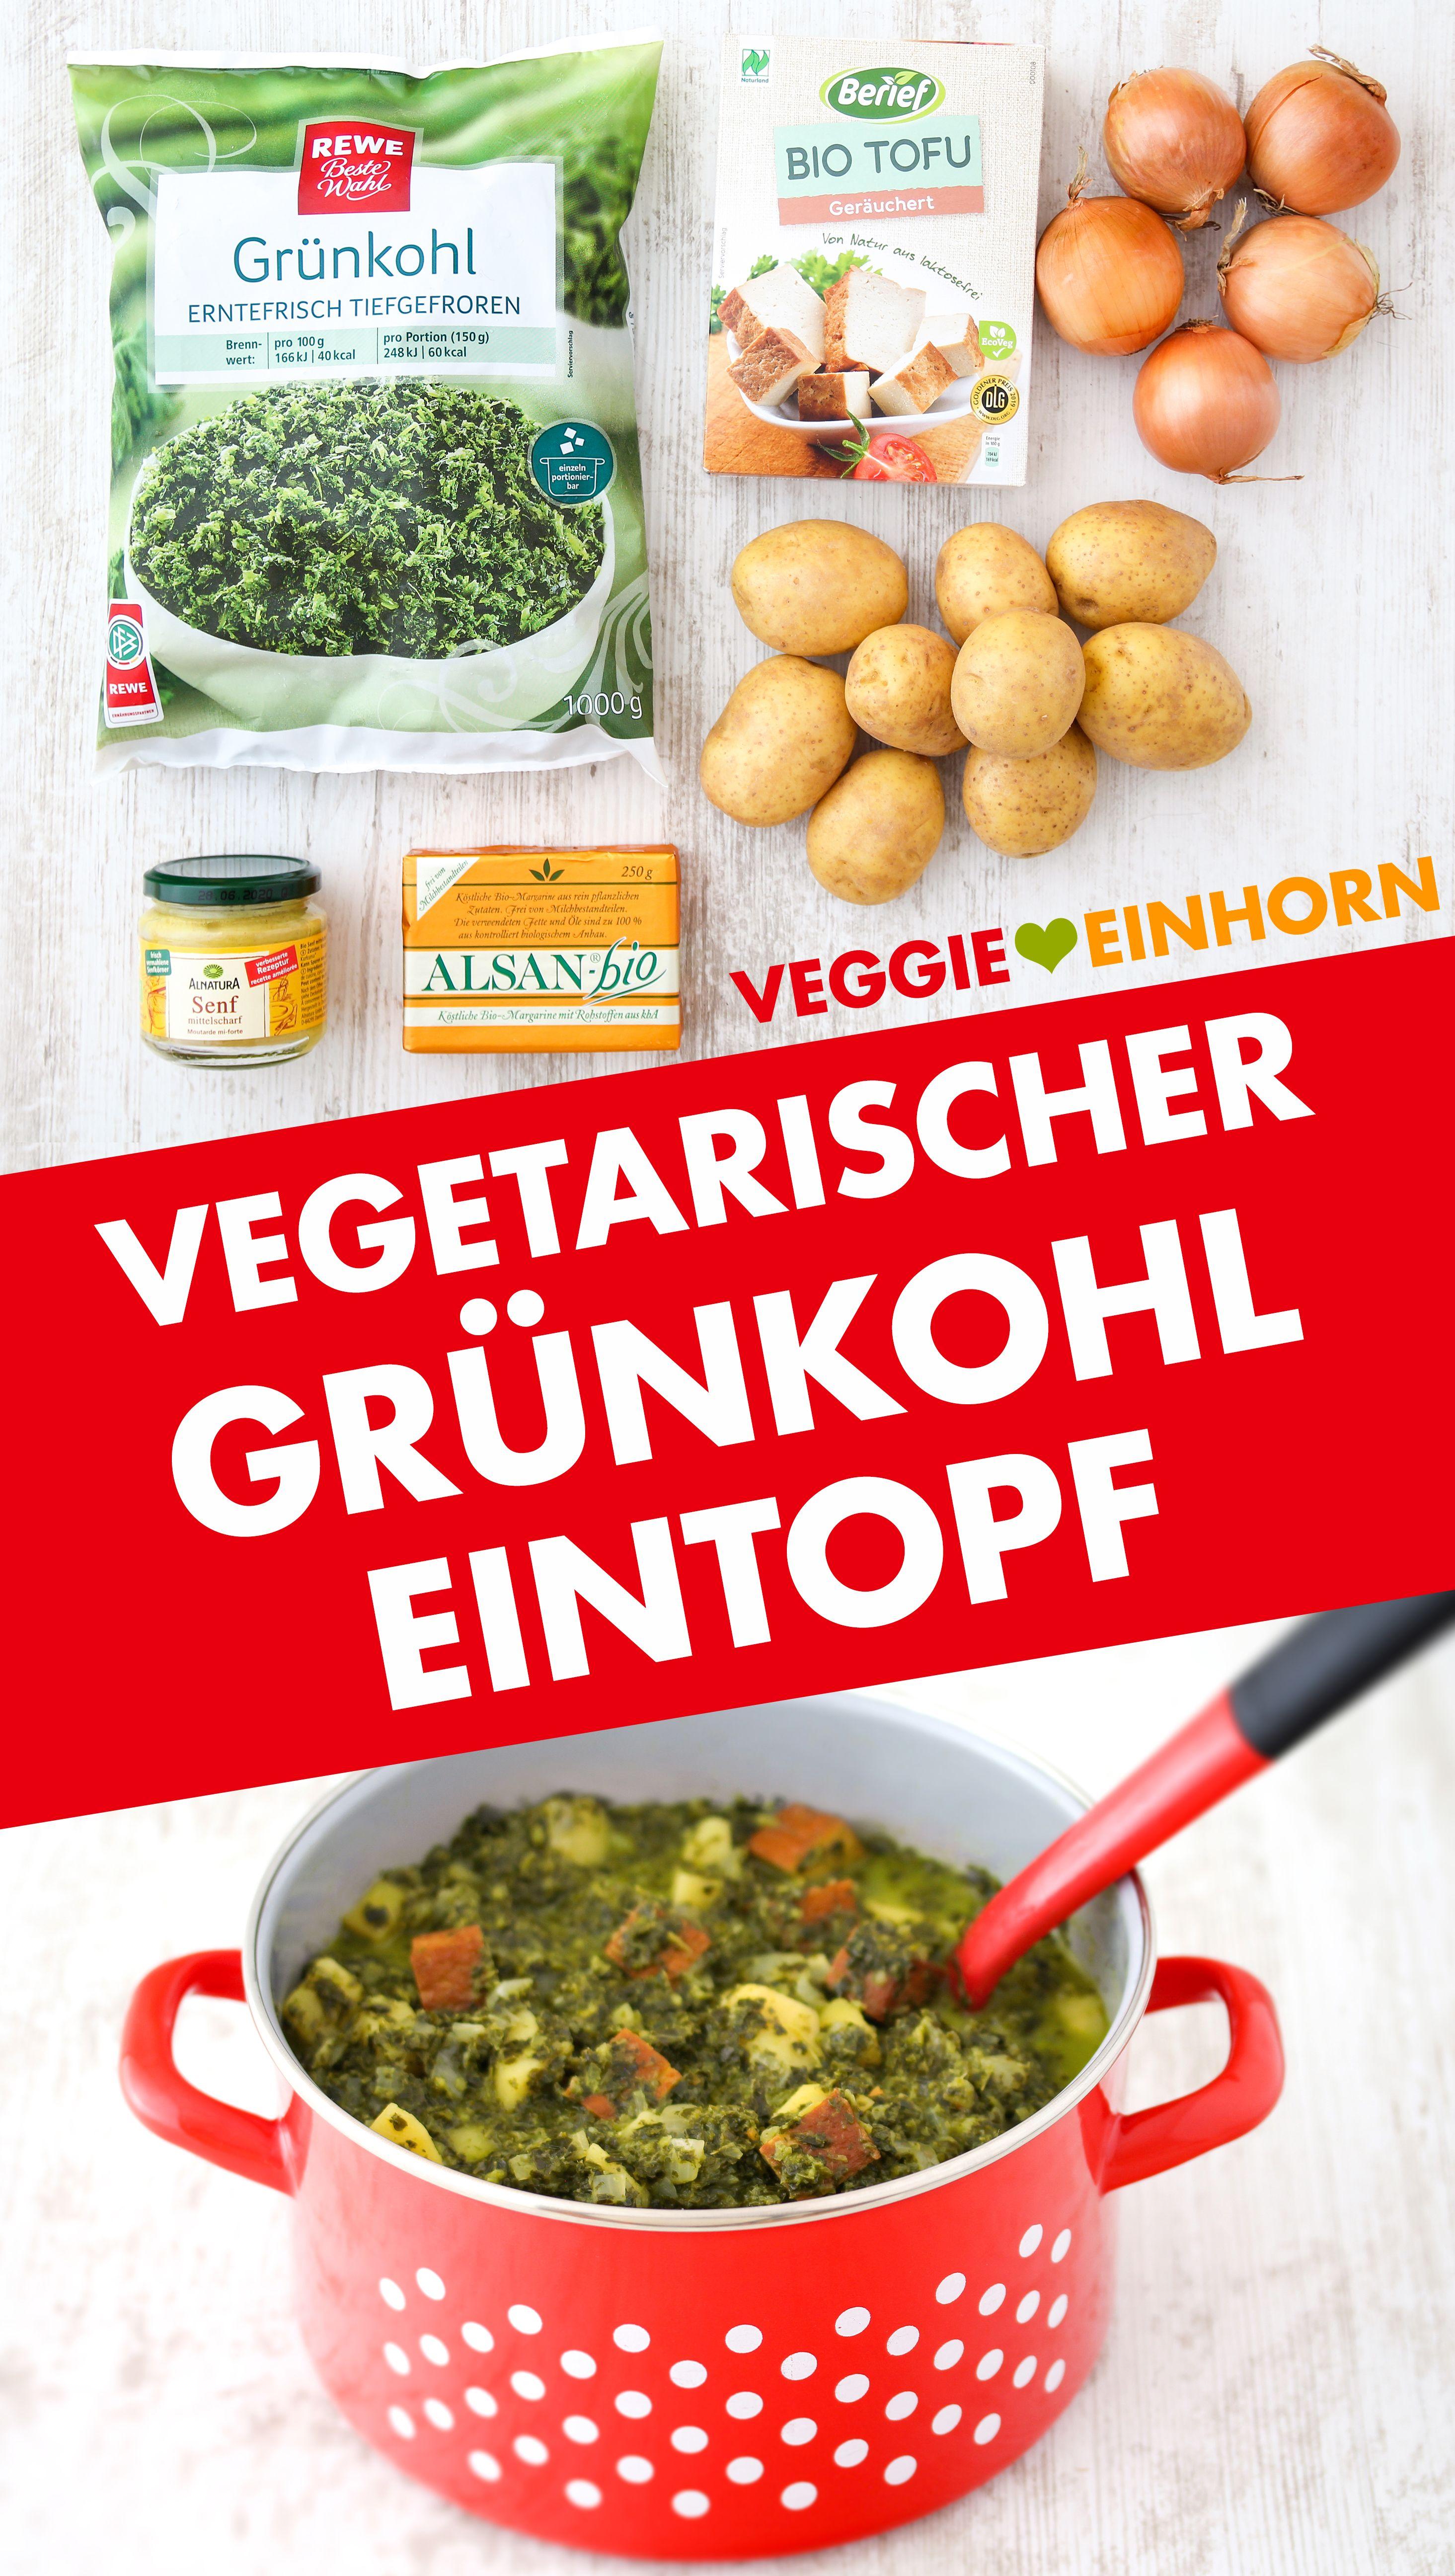 Veganer Grünkohleintopf | Grünkohl Eintopf vegetarisch